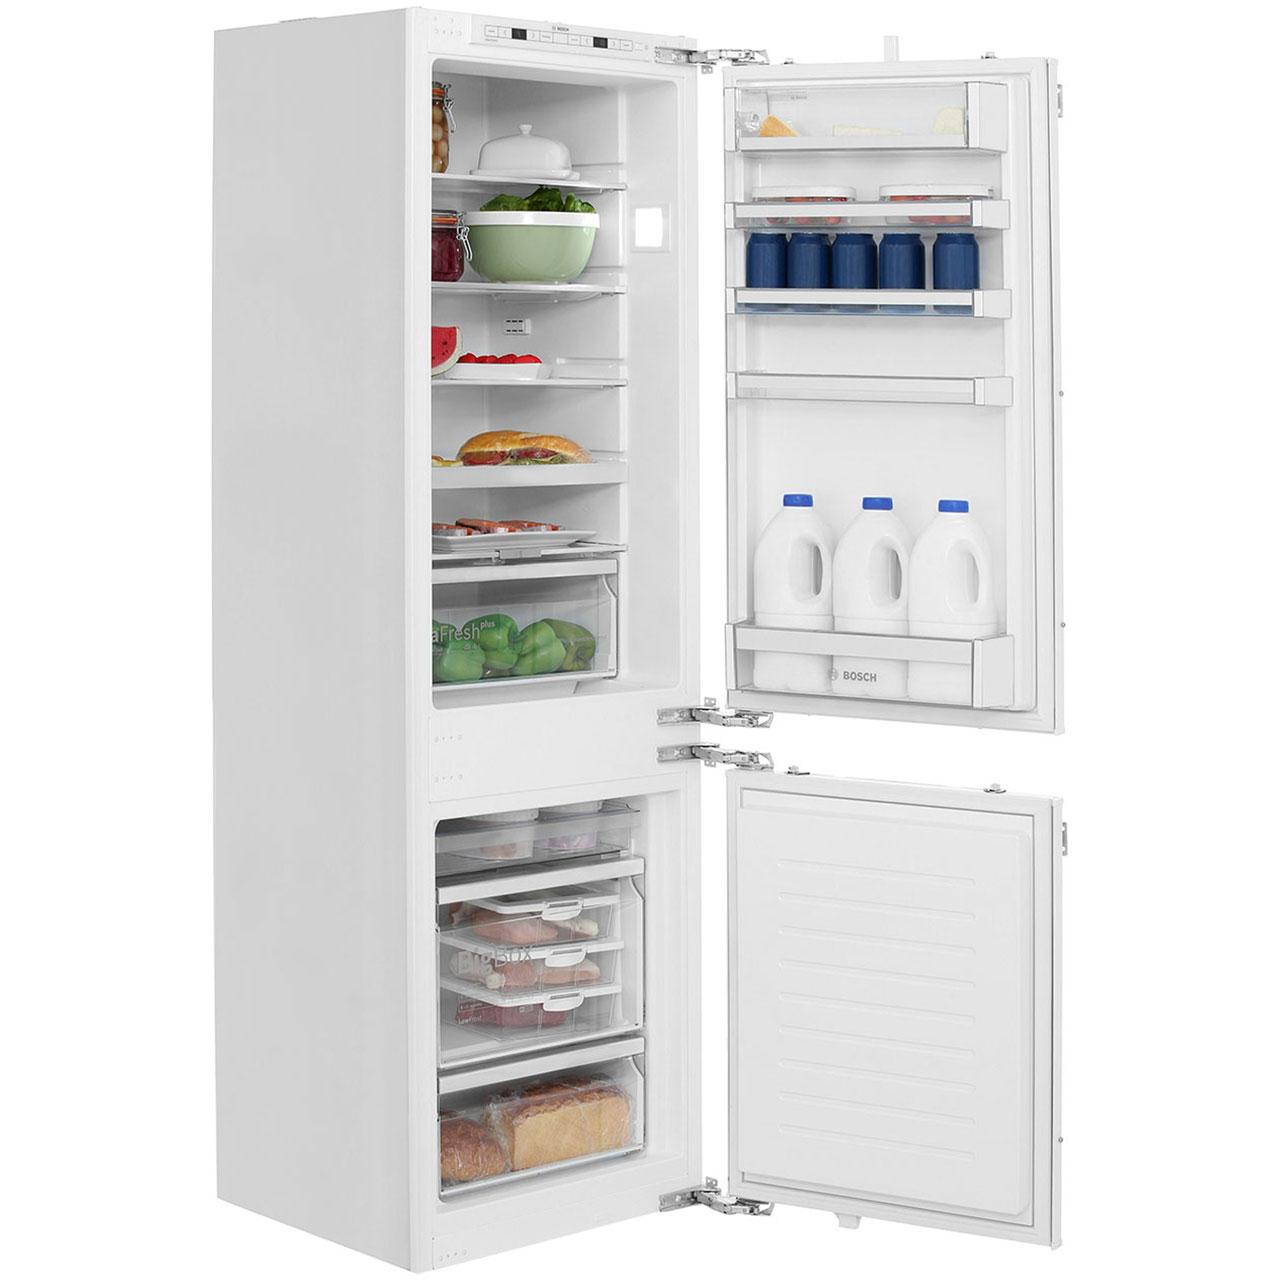 Bosch Serie 6 KIS86AF30G Integrated Fridge Freezer in White